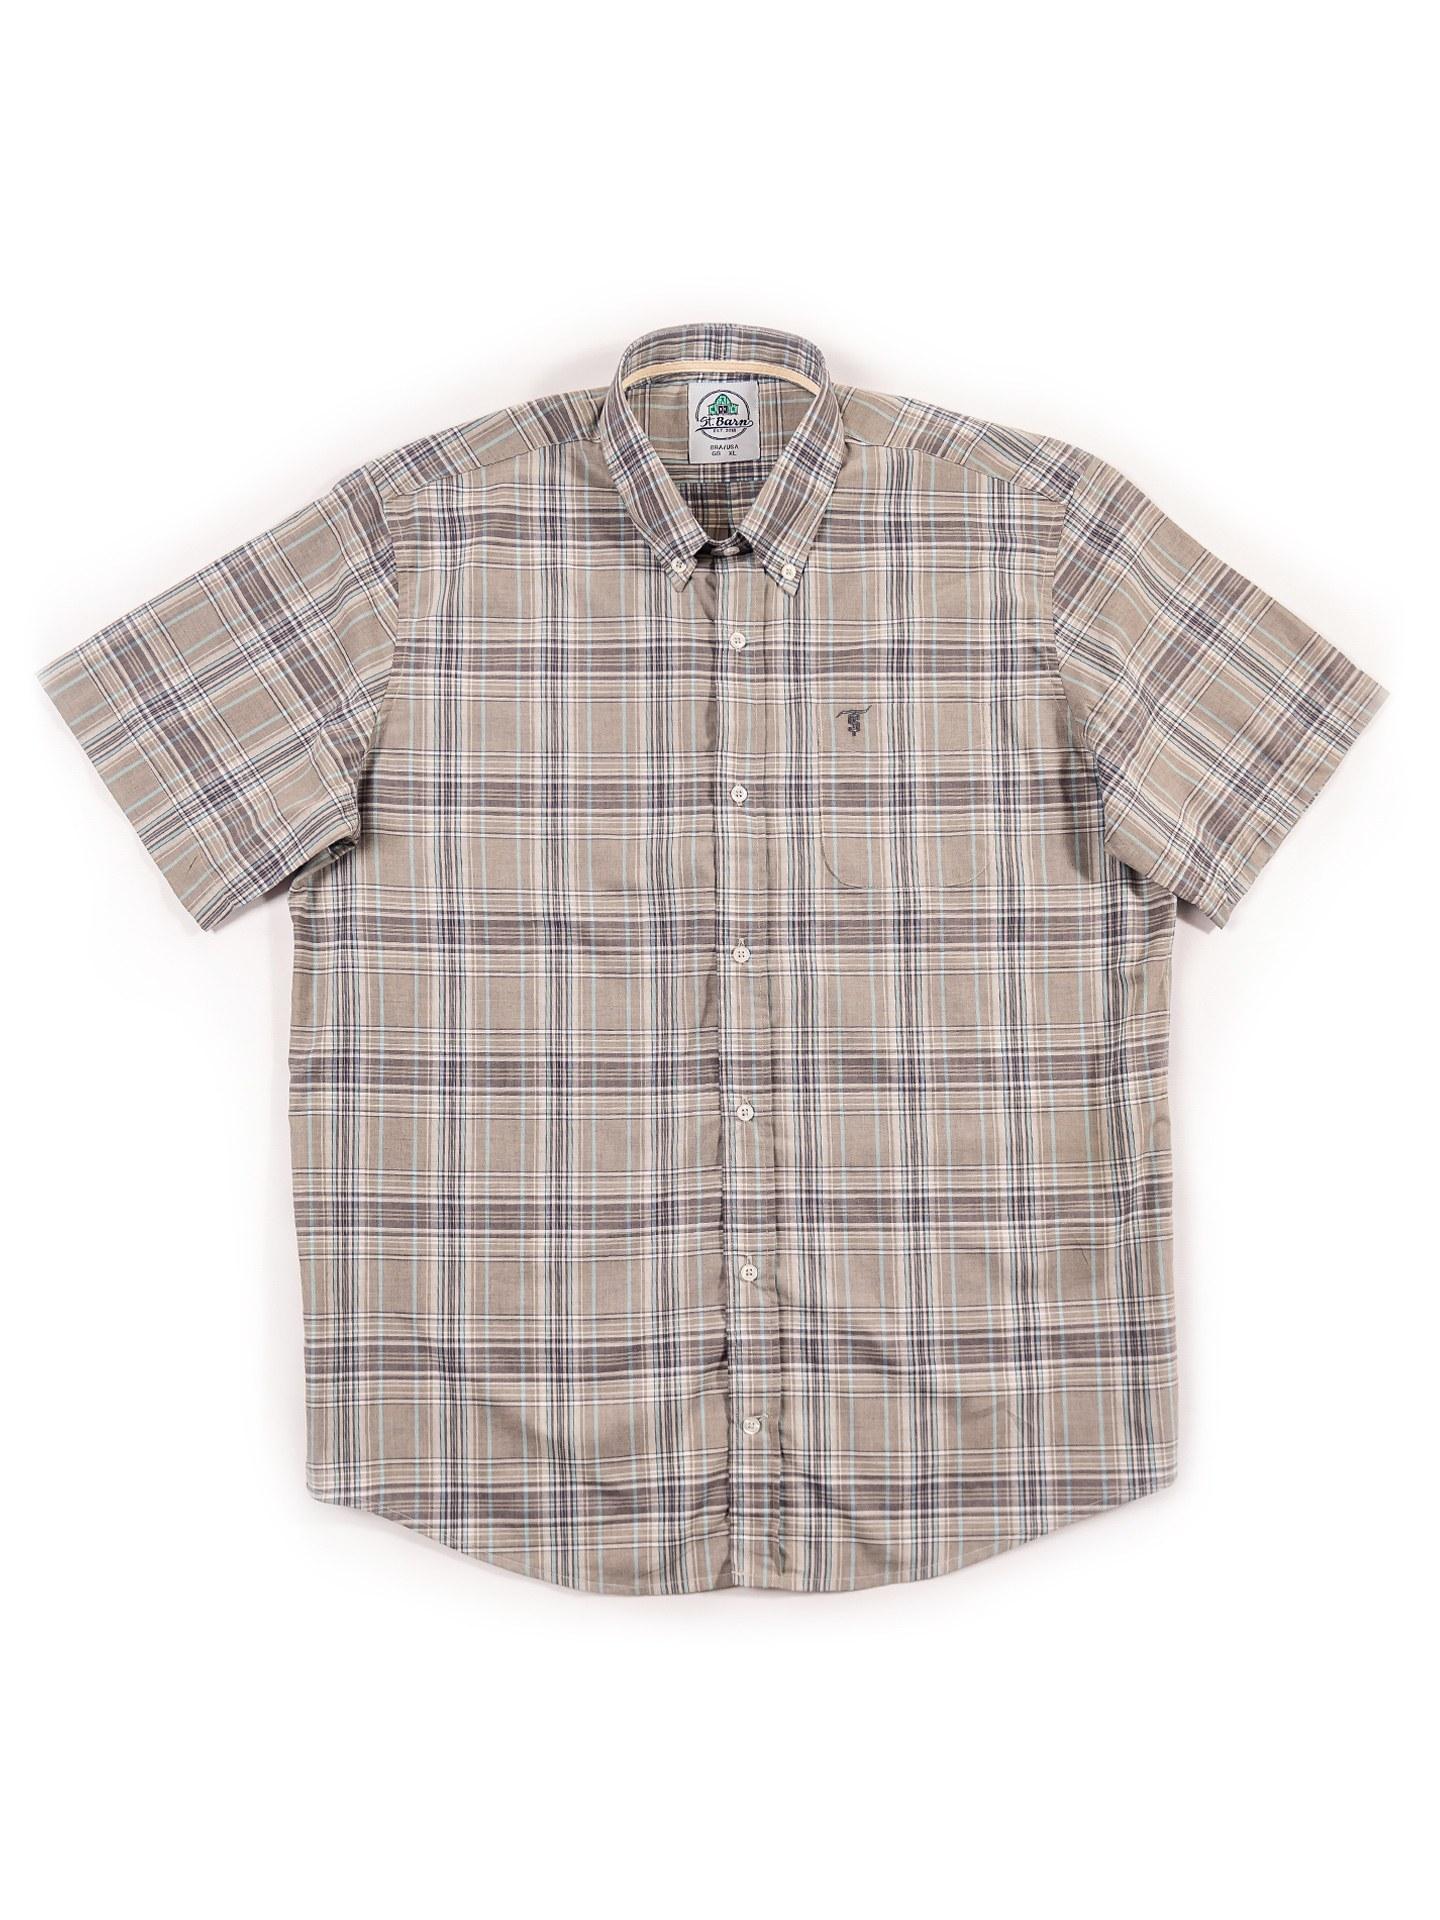 Camisa Xadrez Masculina St. Barn Manga Curta